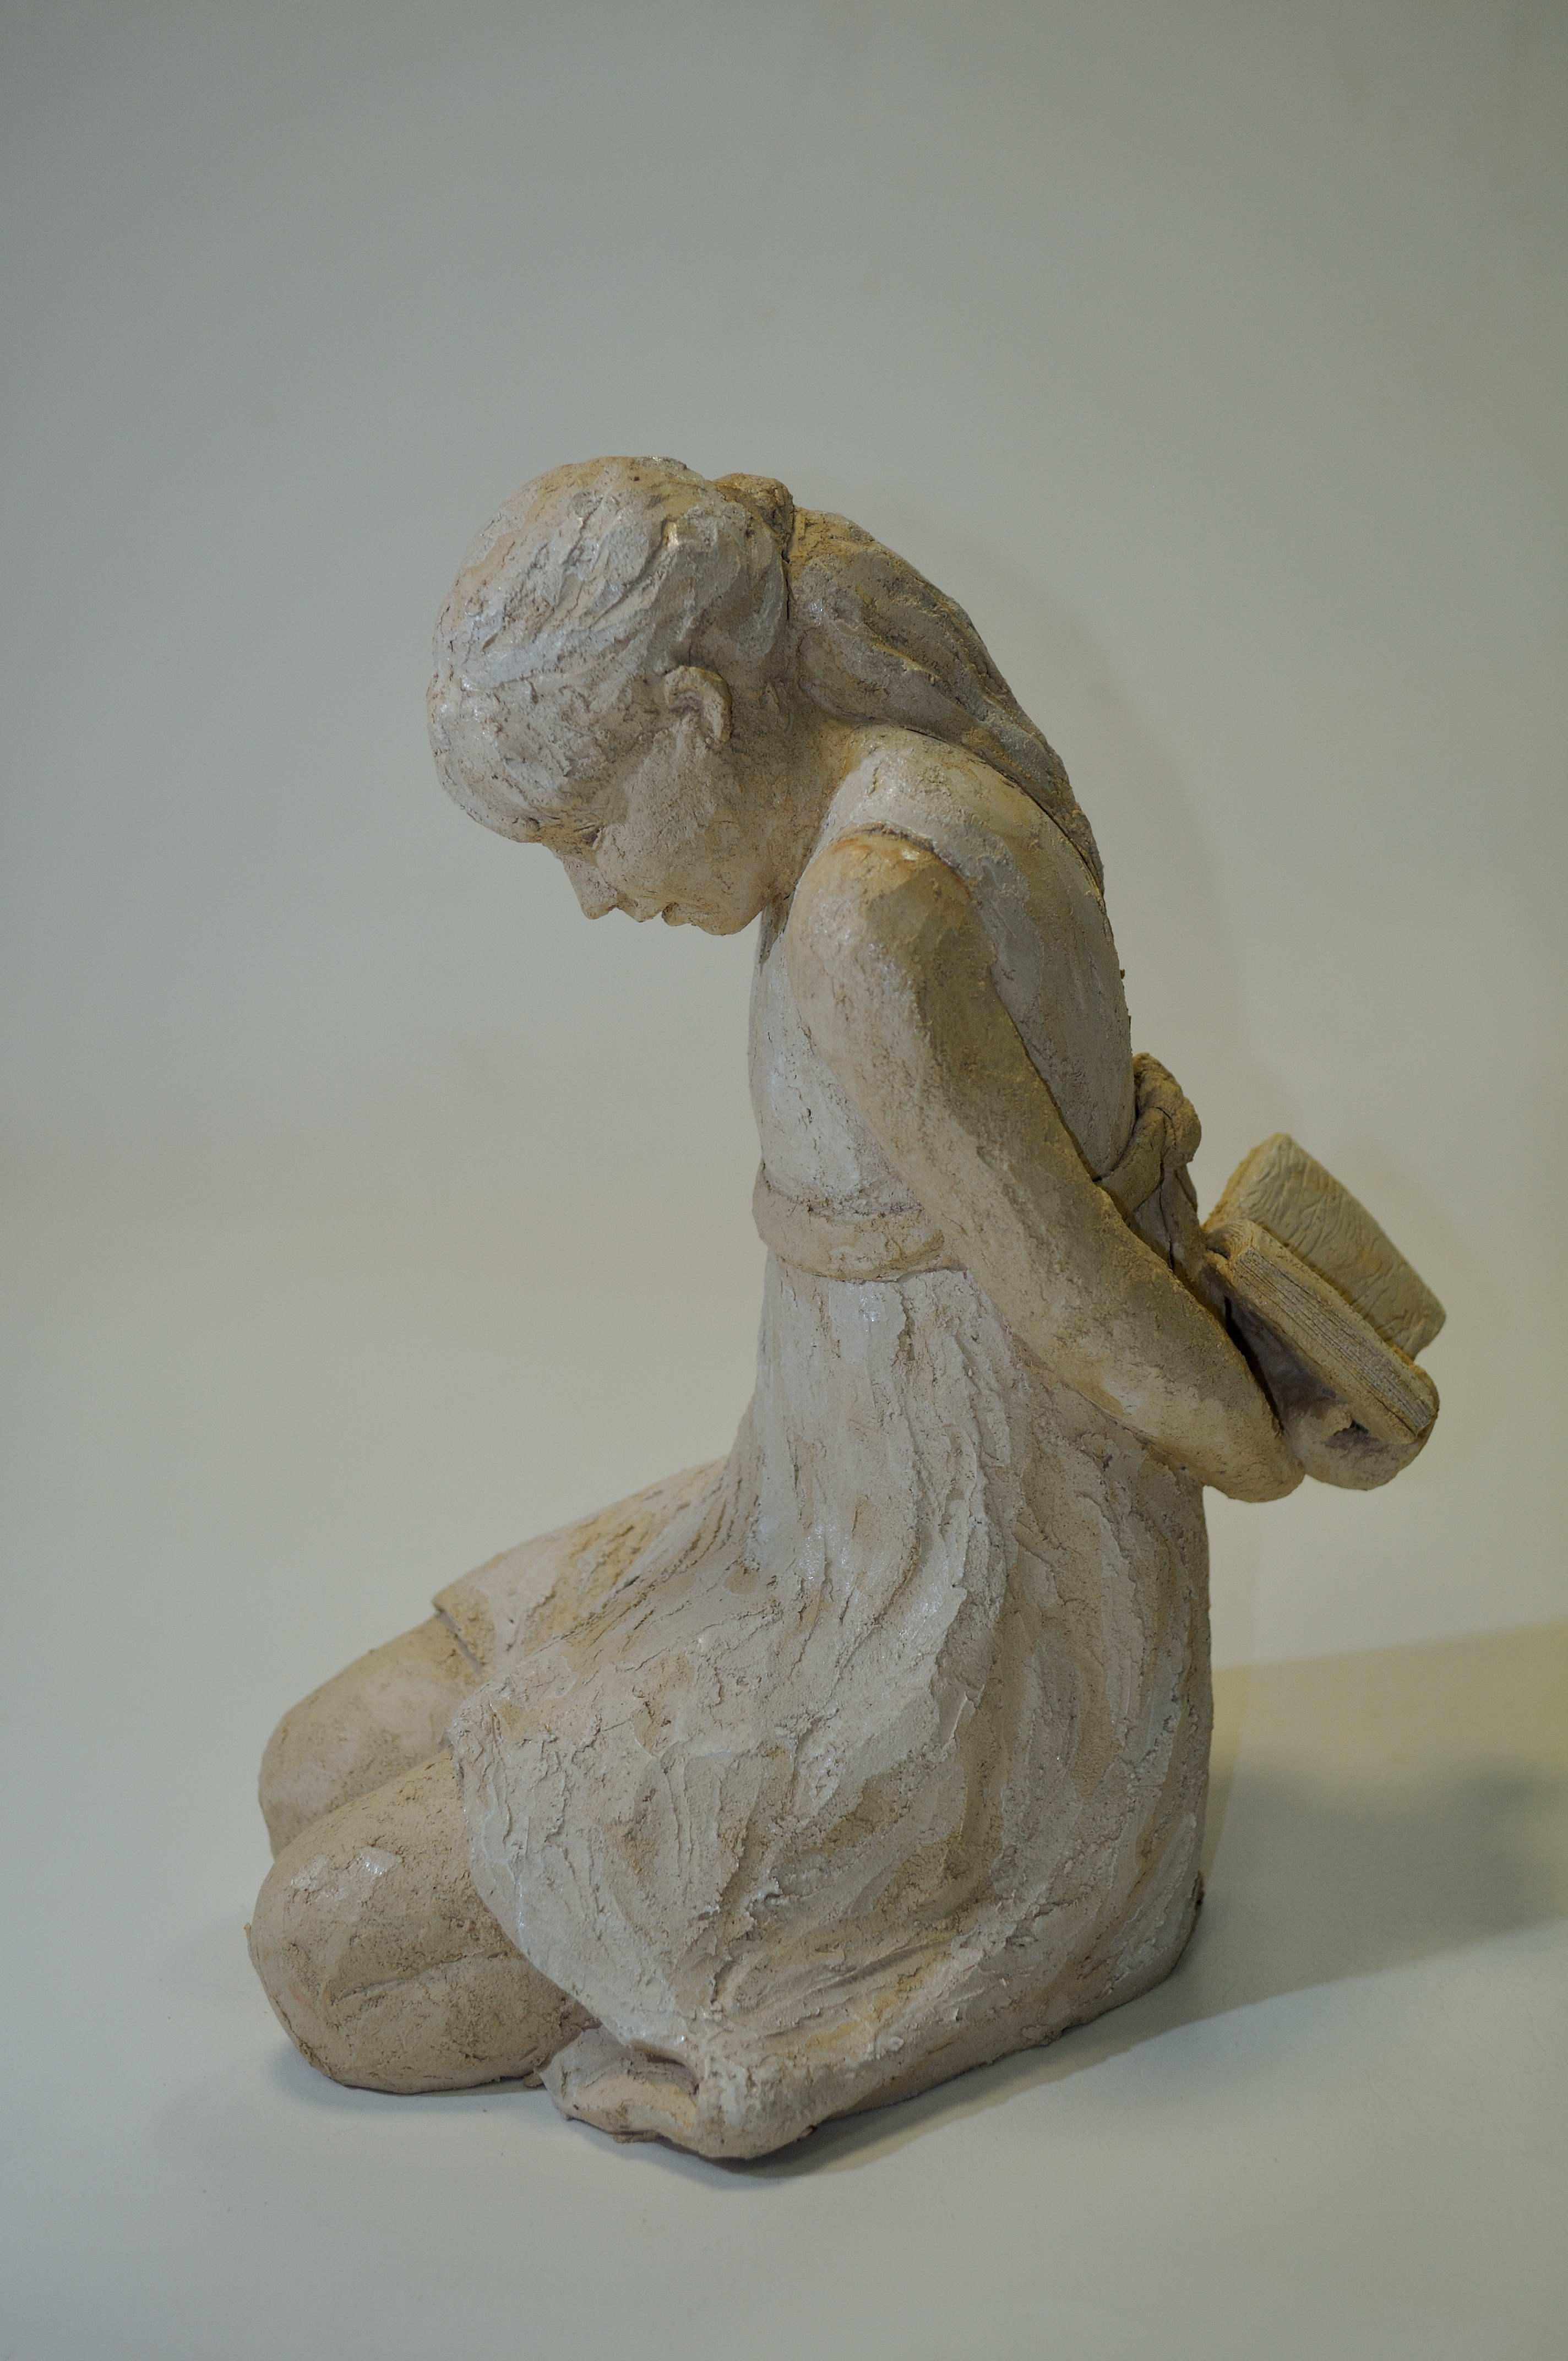 sculpture fillette terre cuite petite fille sculpture